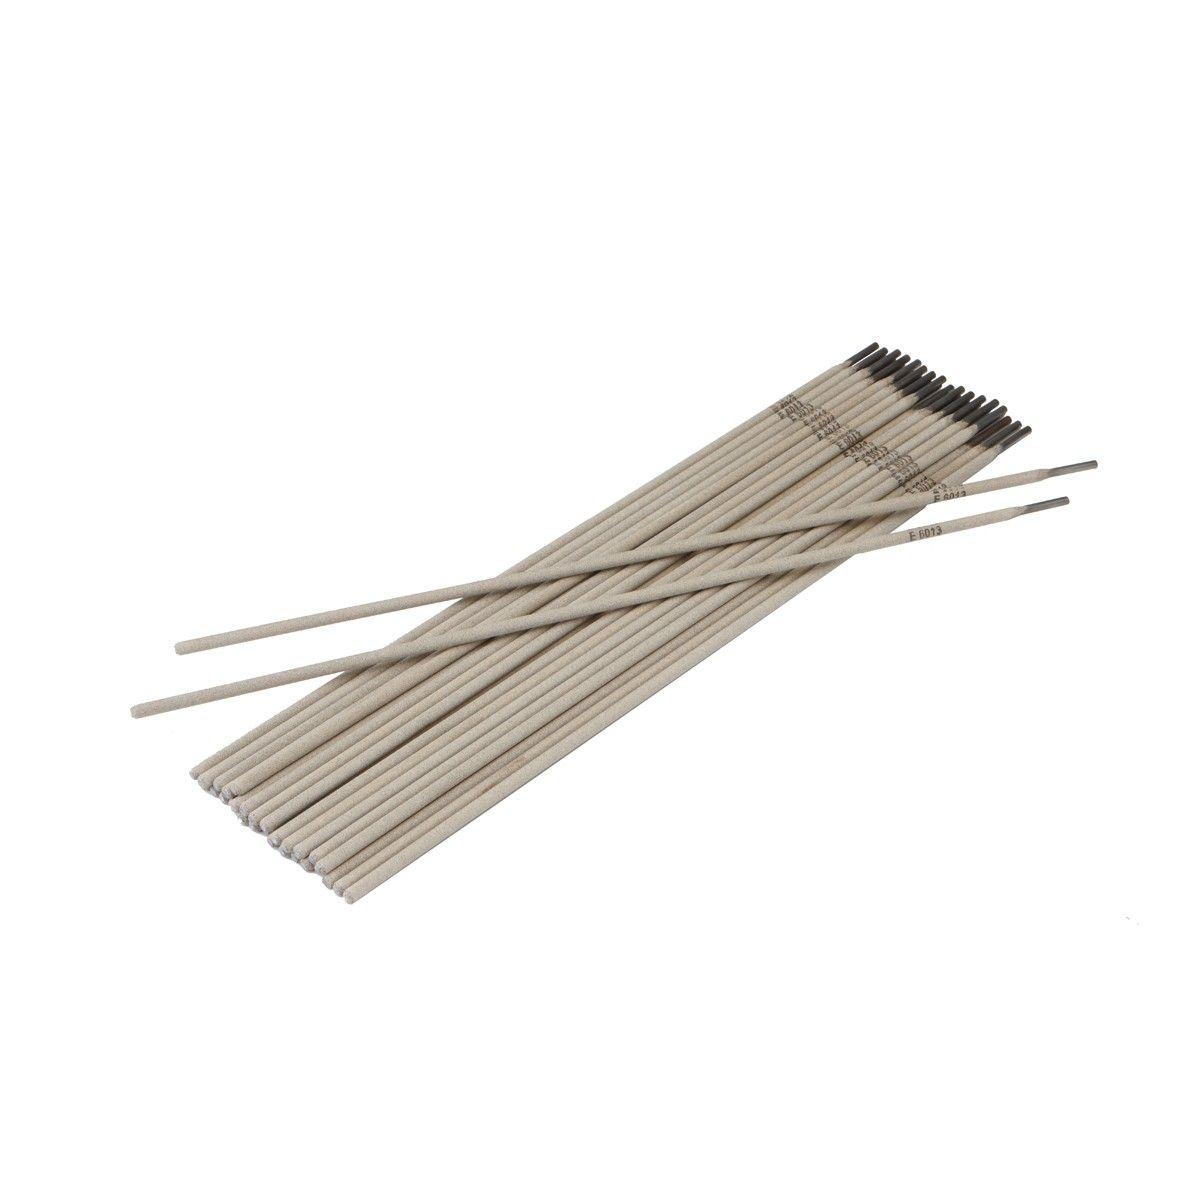 1/8 in. AWS E6013 Welding Electrode, 2 lbs. | Welding | Pinterest ...